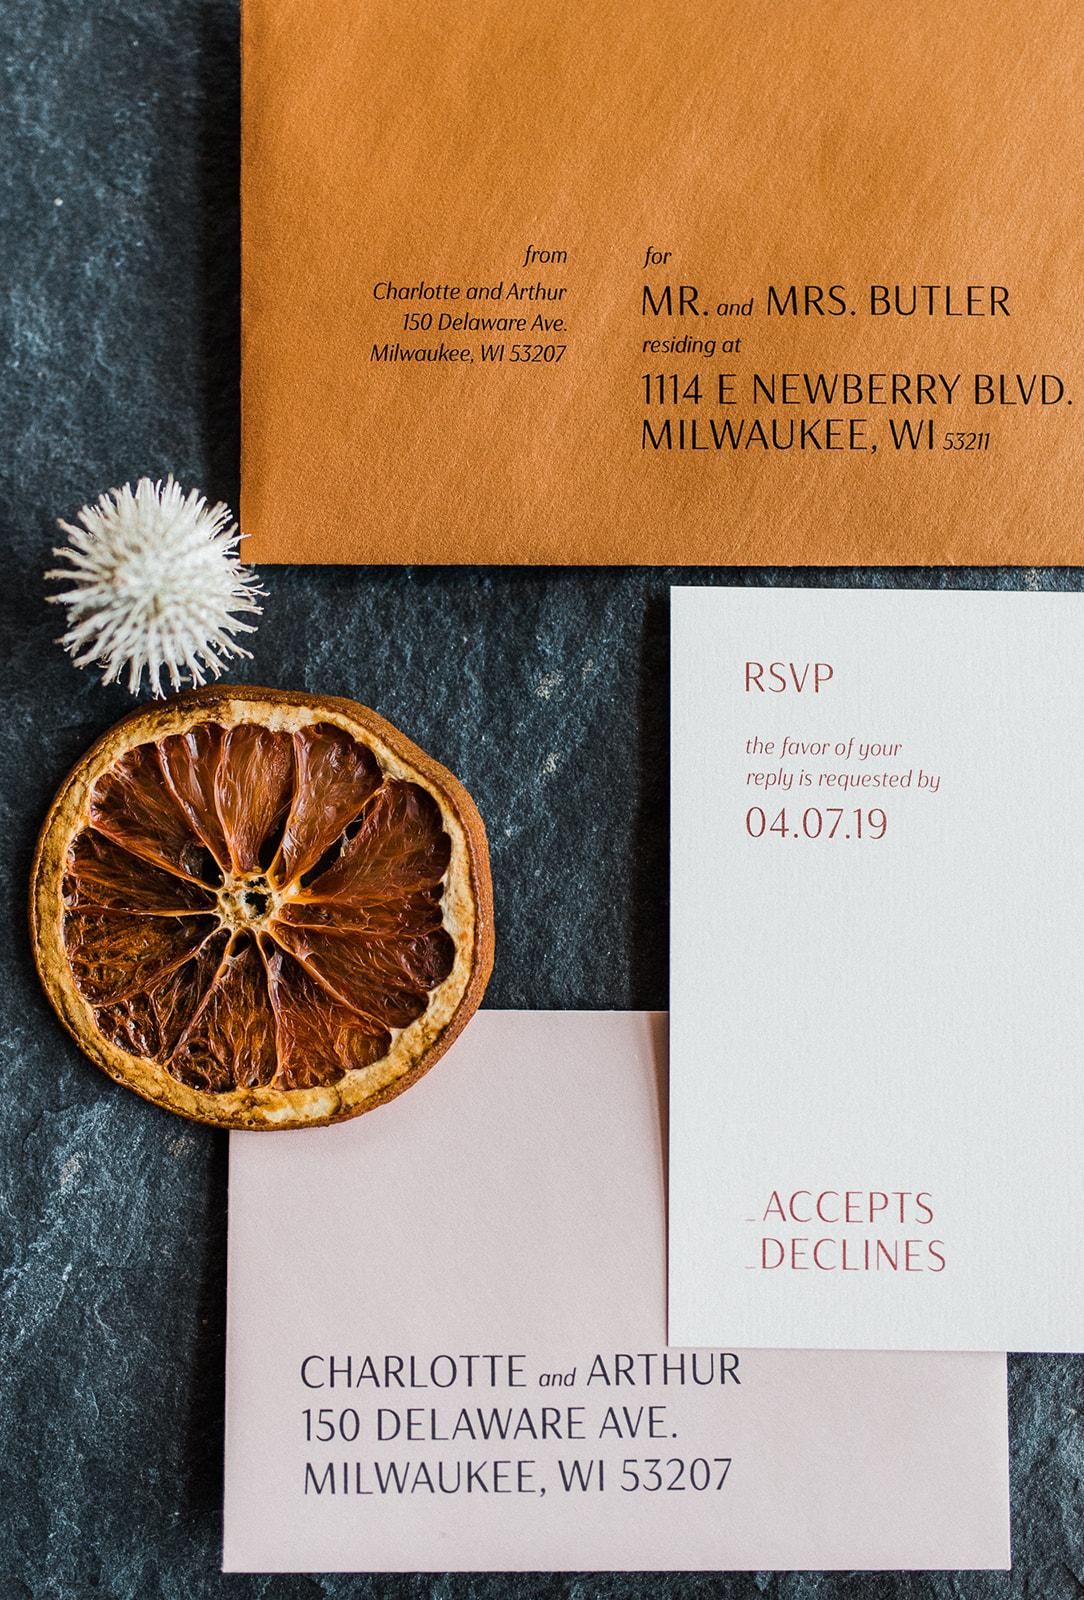 hall-creative-co-wedding-stationery-milwaukee-modern-good-city-5.jpg